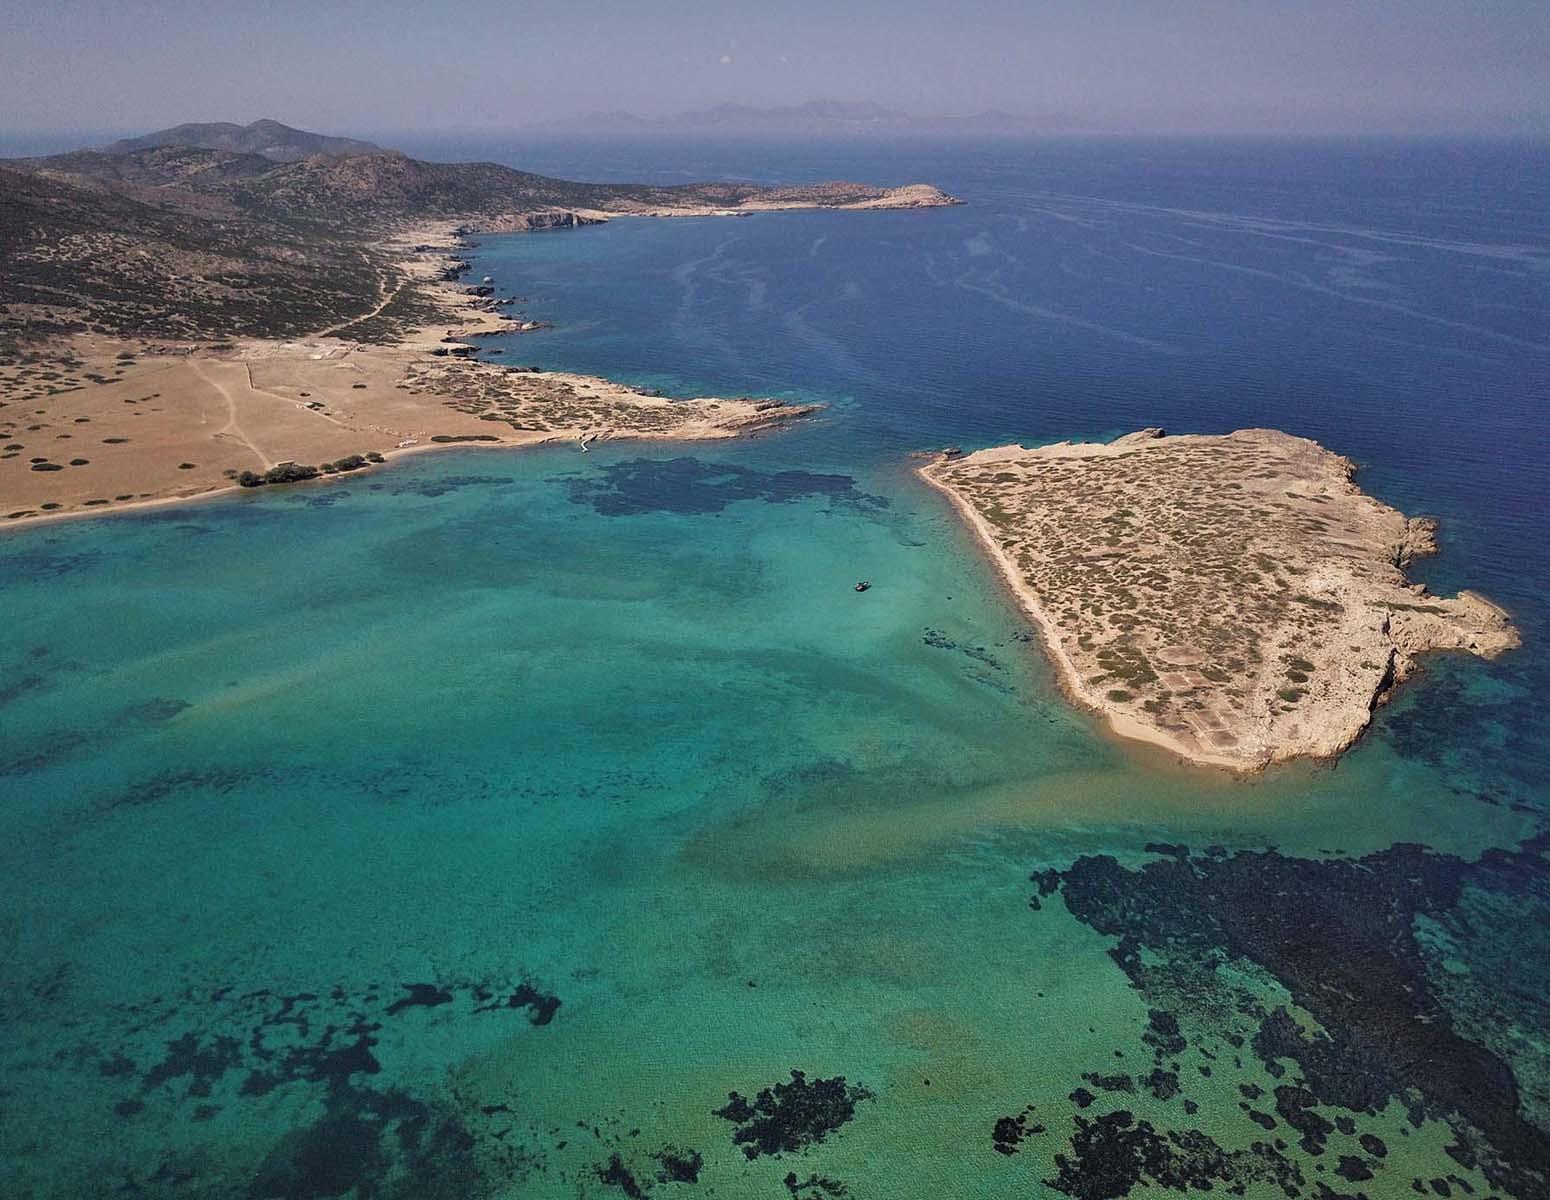 Mykonos - Paros - Antiparos - Despotiko - Private day cruise | Don Blue RIB boat rental